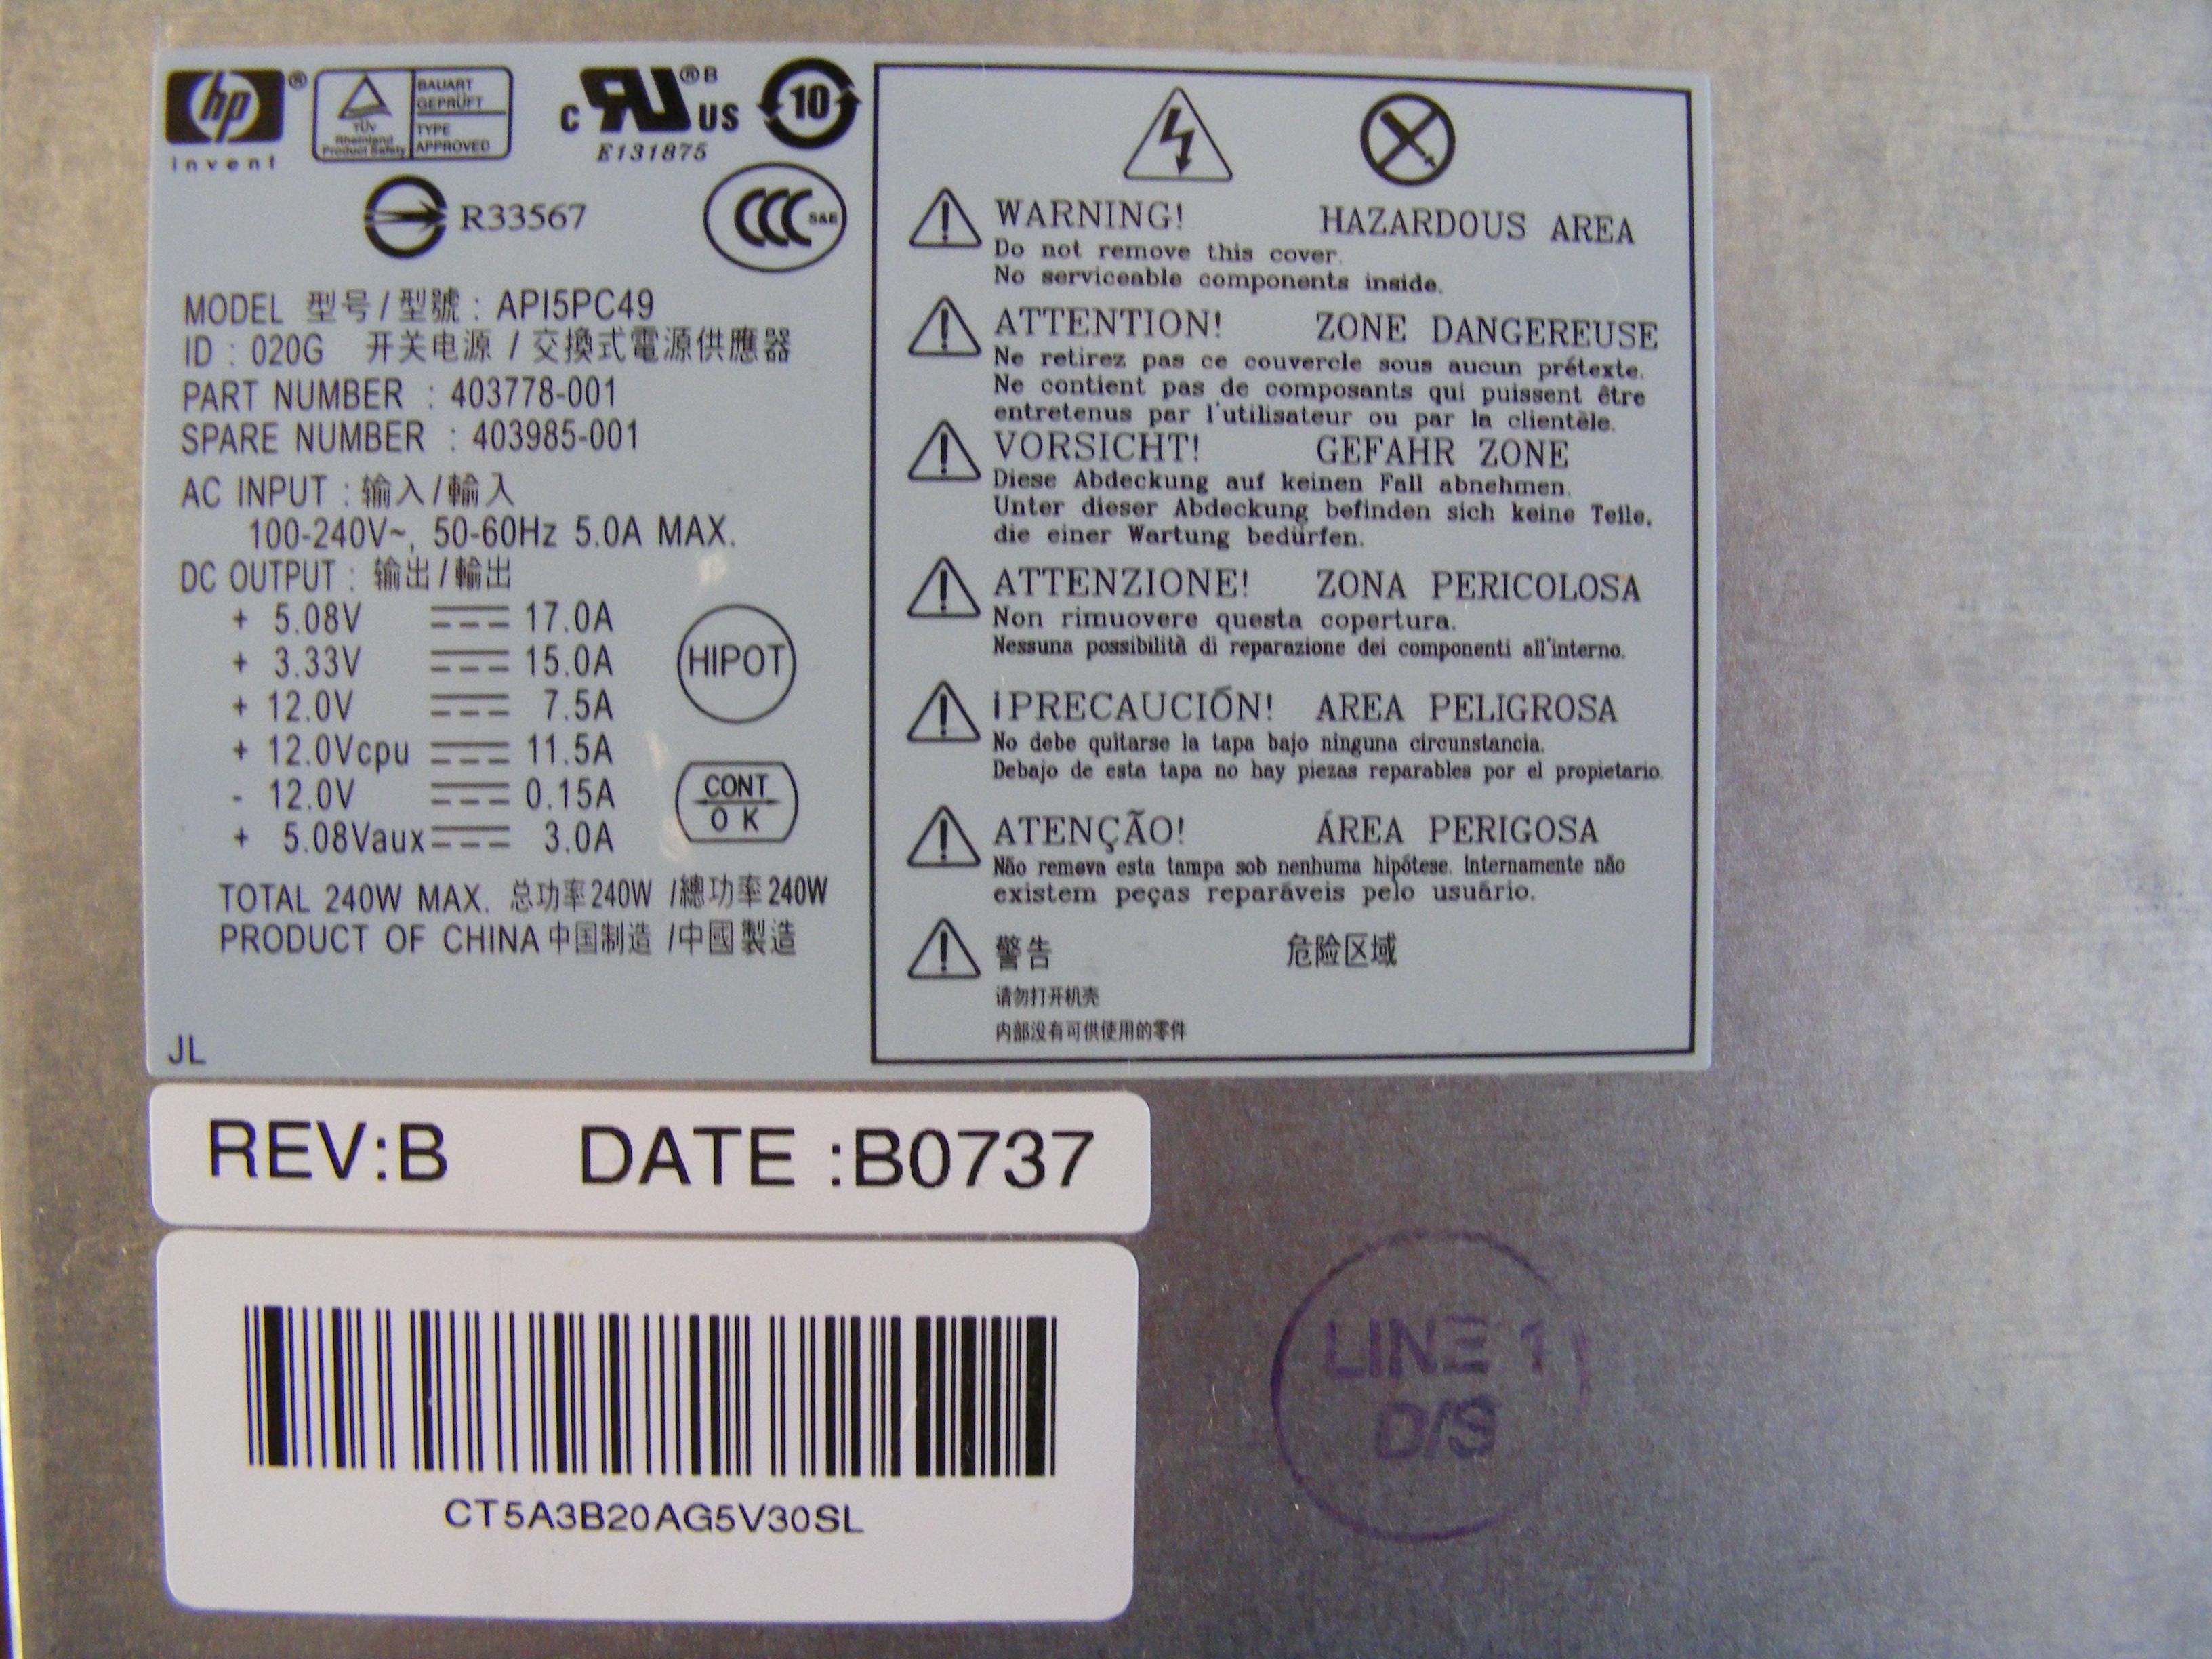 DSCF1970JPG PC Power Supply Repair